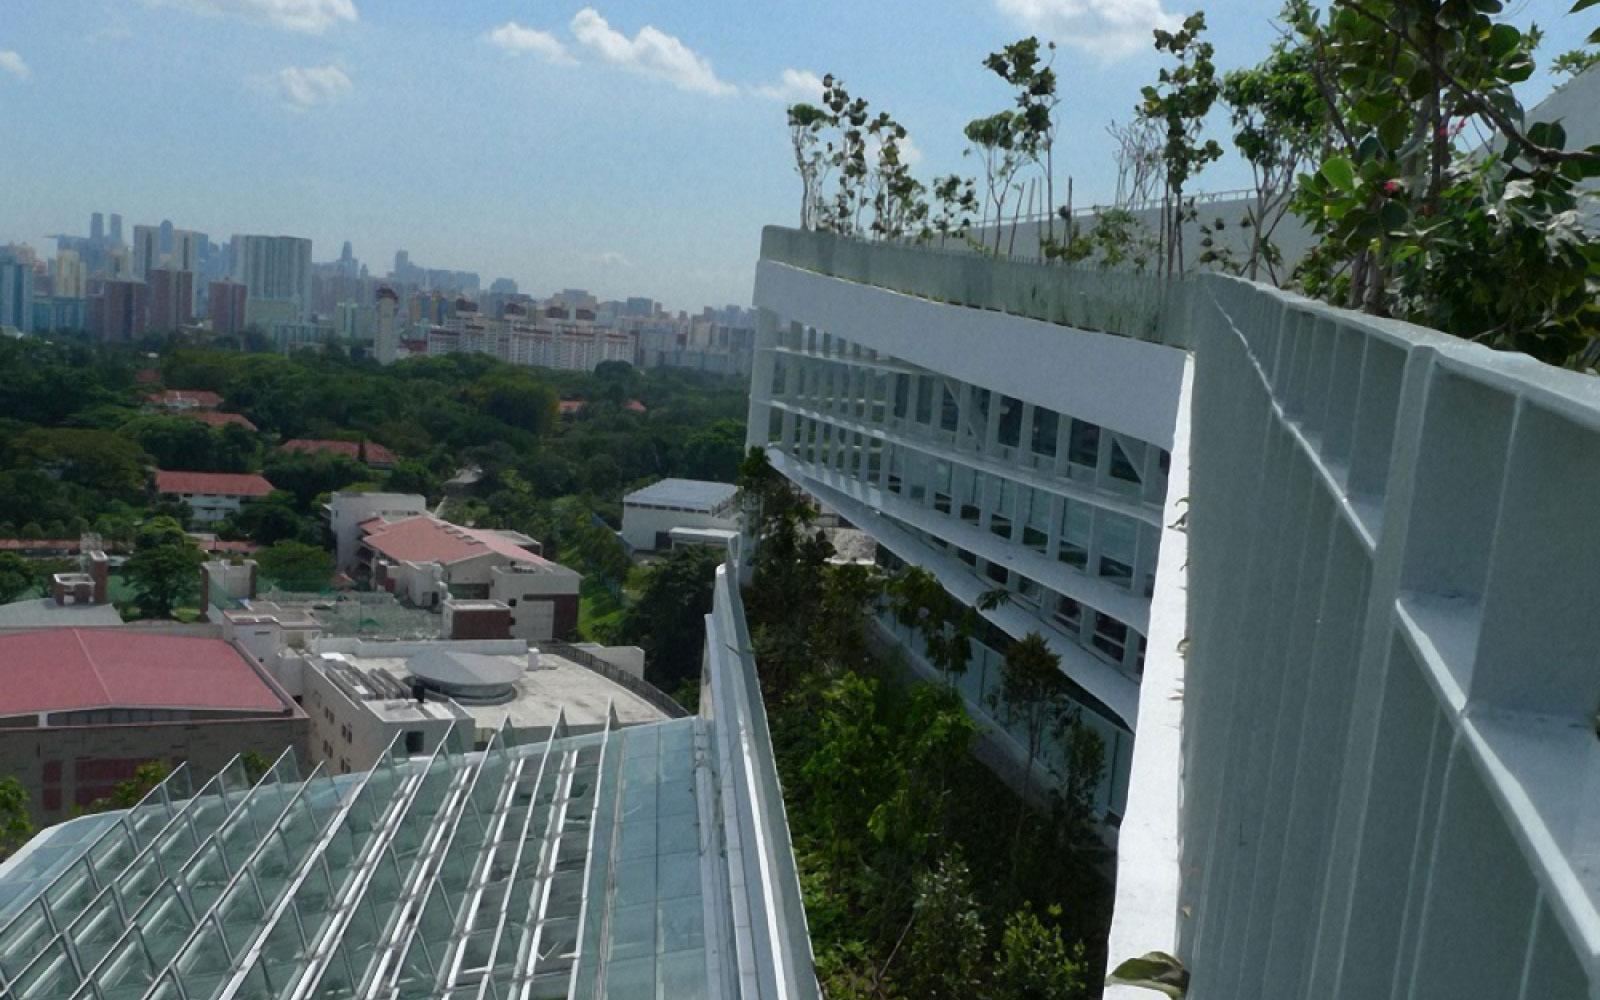 Ecological architect planter box for solaris